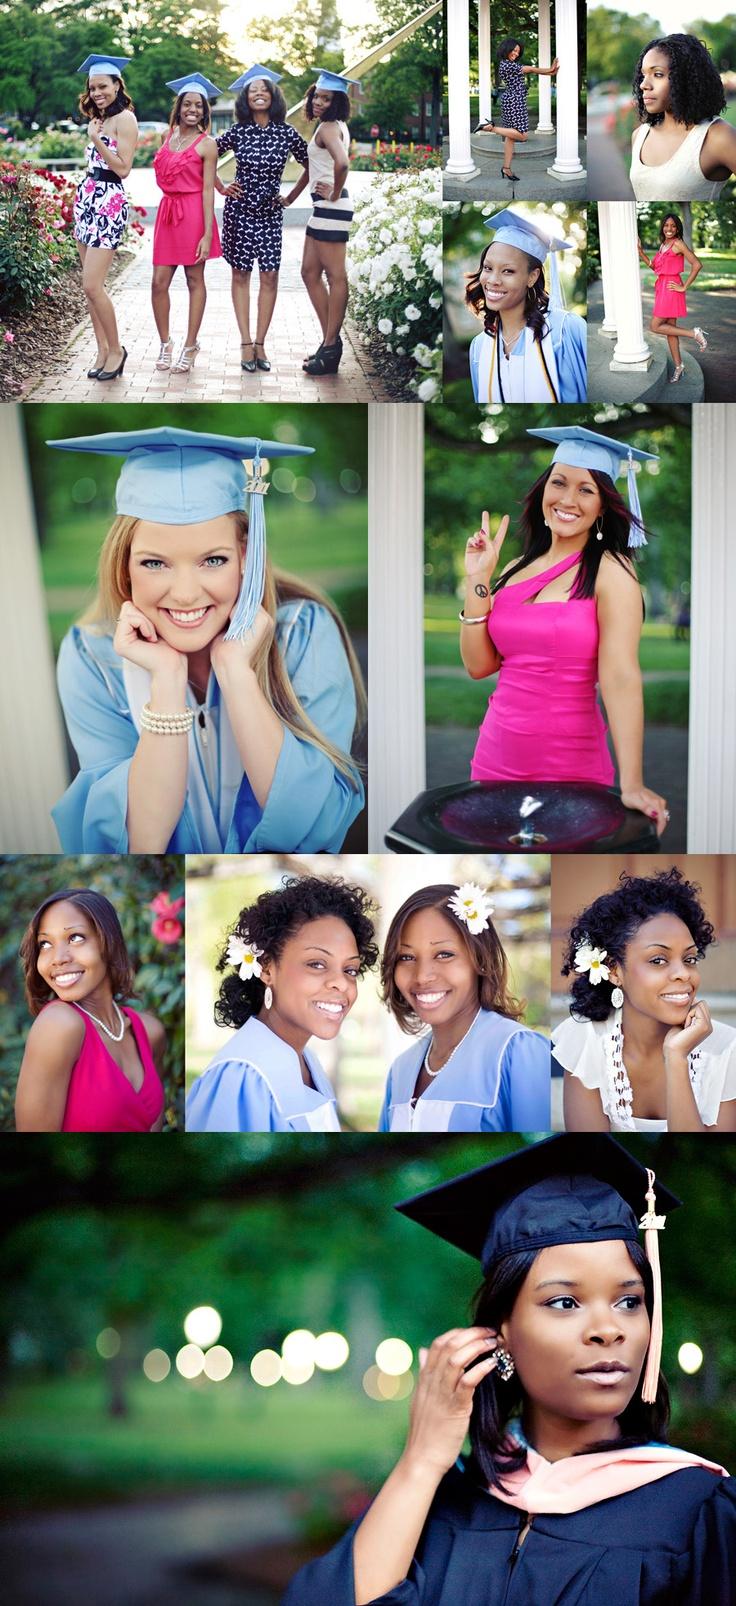 Senior graduation portraits, Posing, friends, flowers